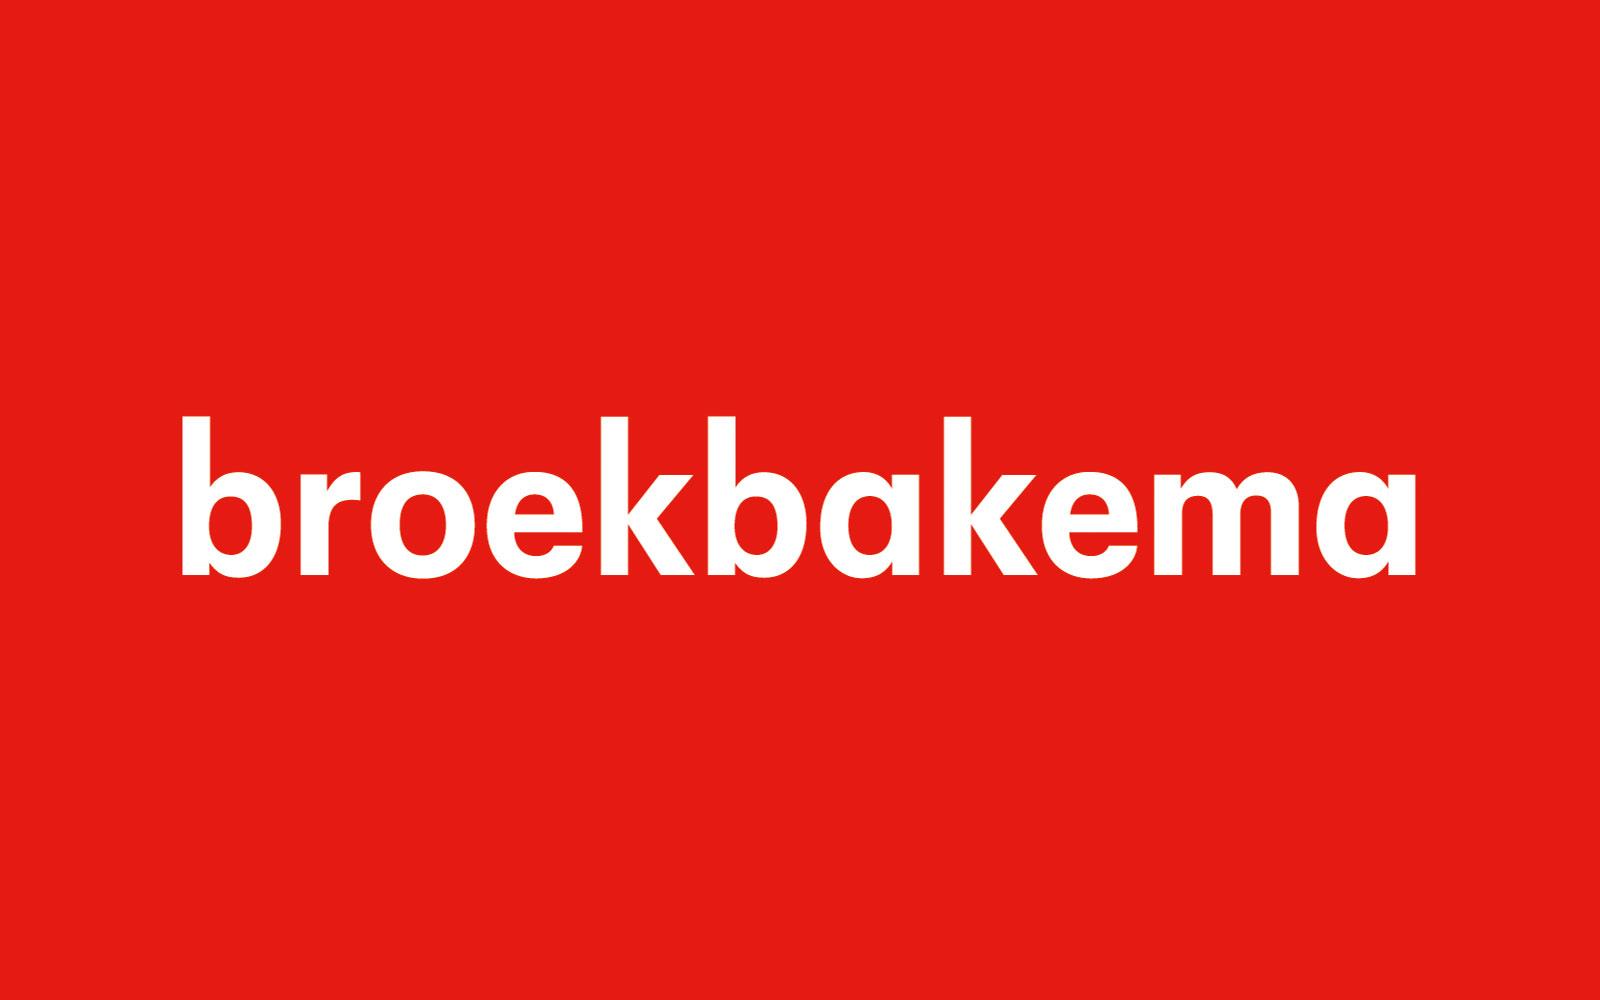 broekbakema-logo.jpg